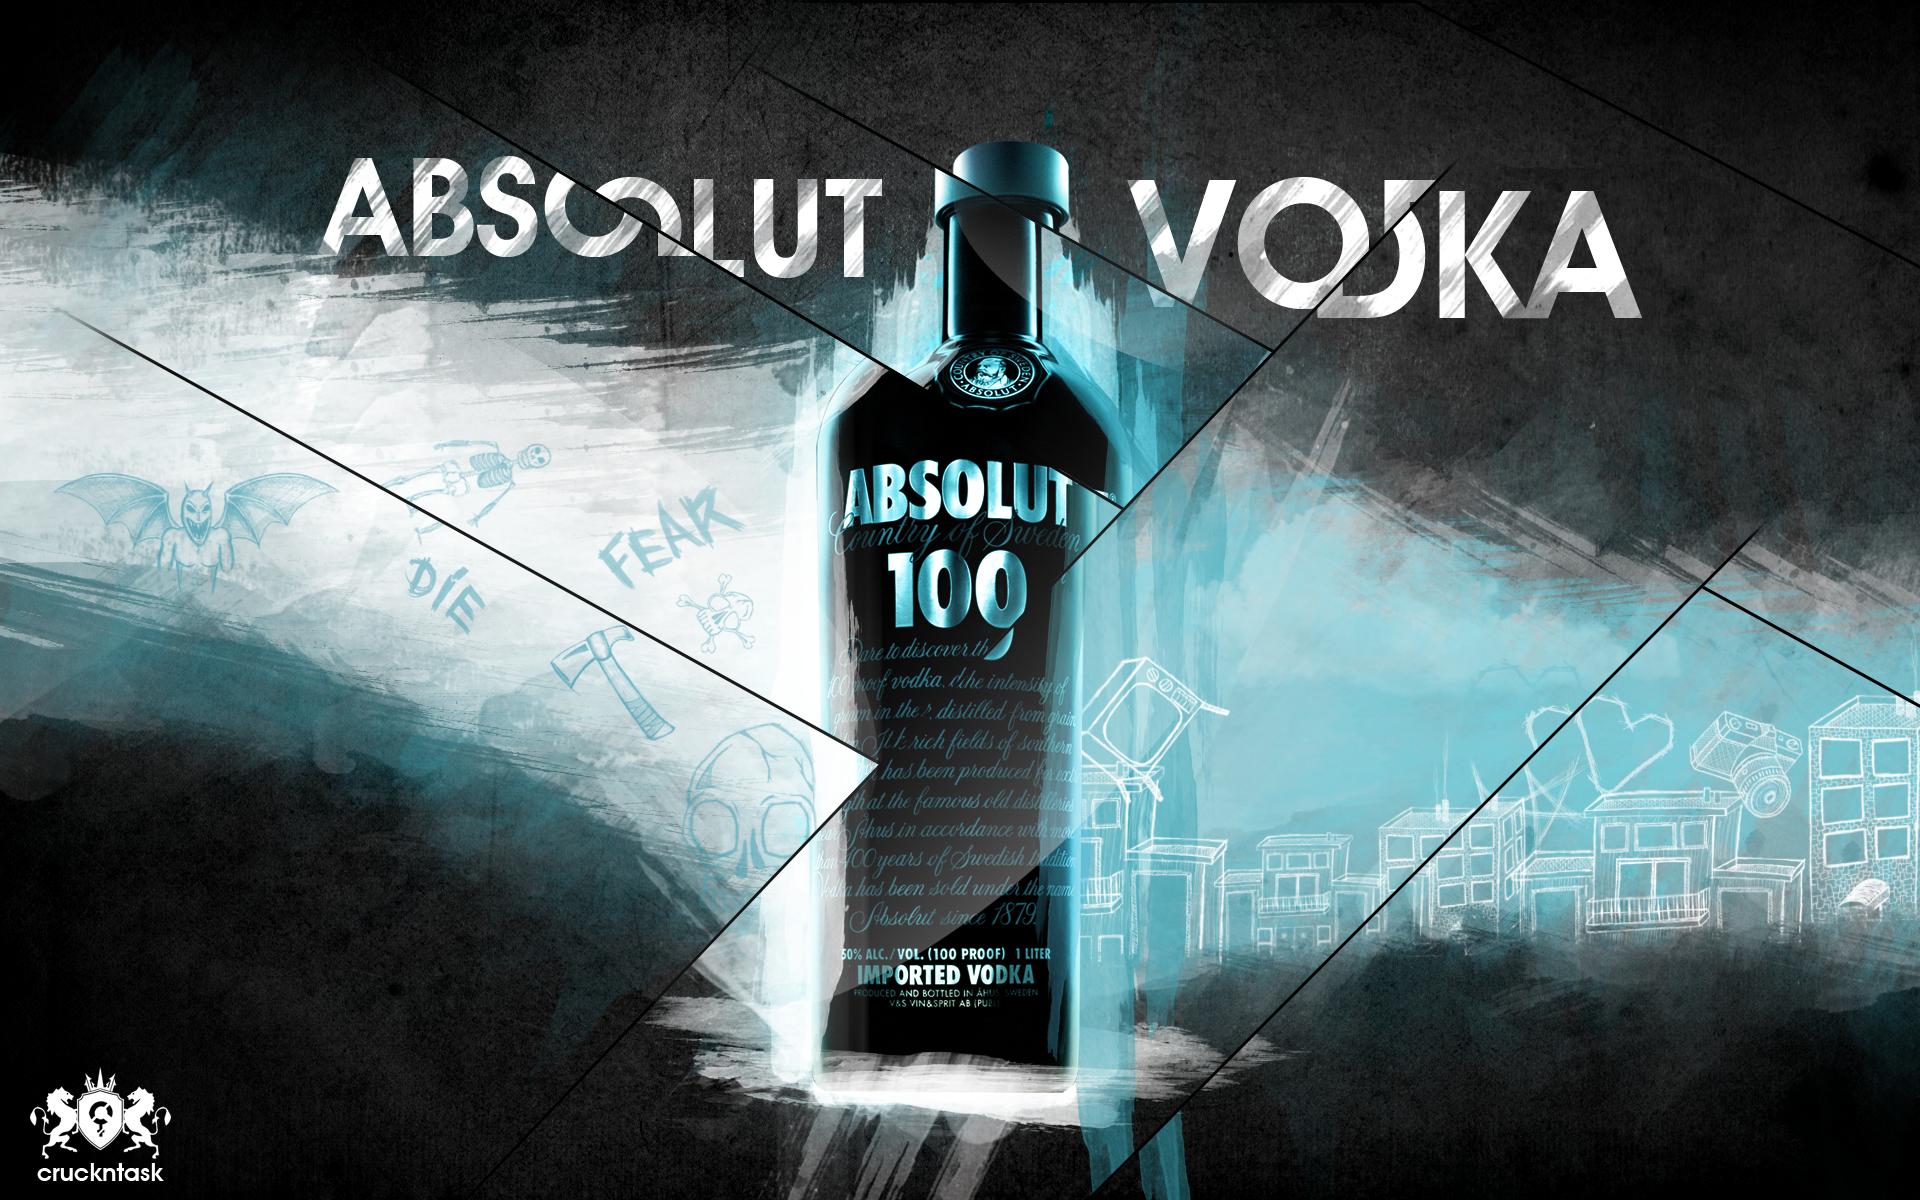 Wallpaper iphone vodka - Absolut Vodka Wallpaper 105725